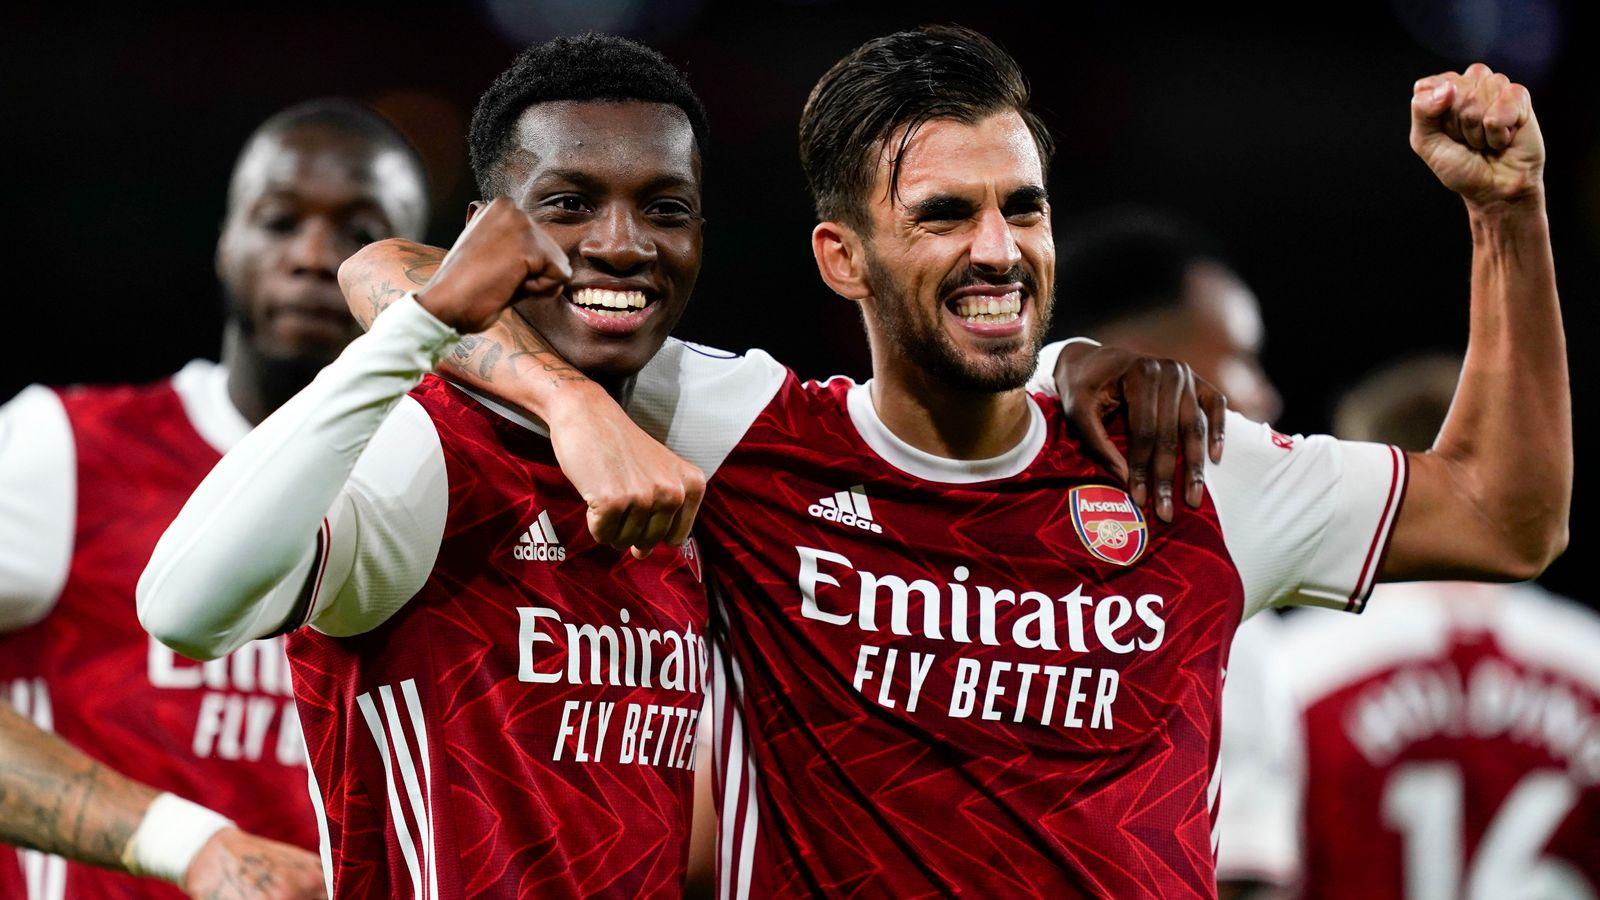 Arsenal show progress but more